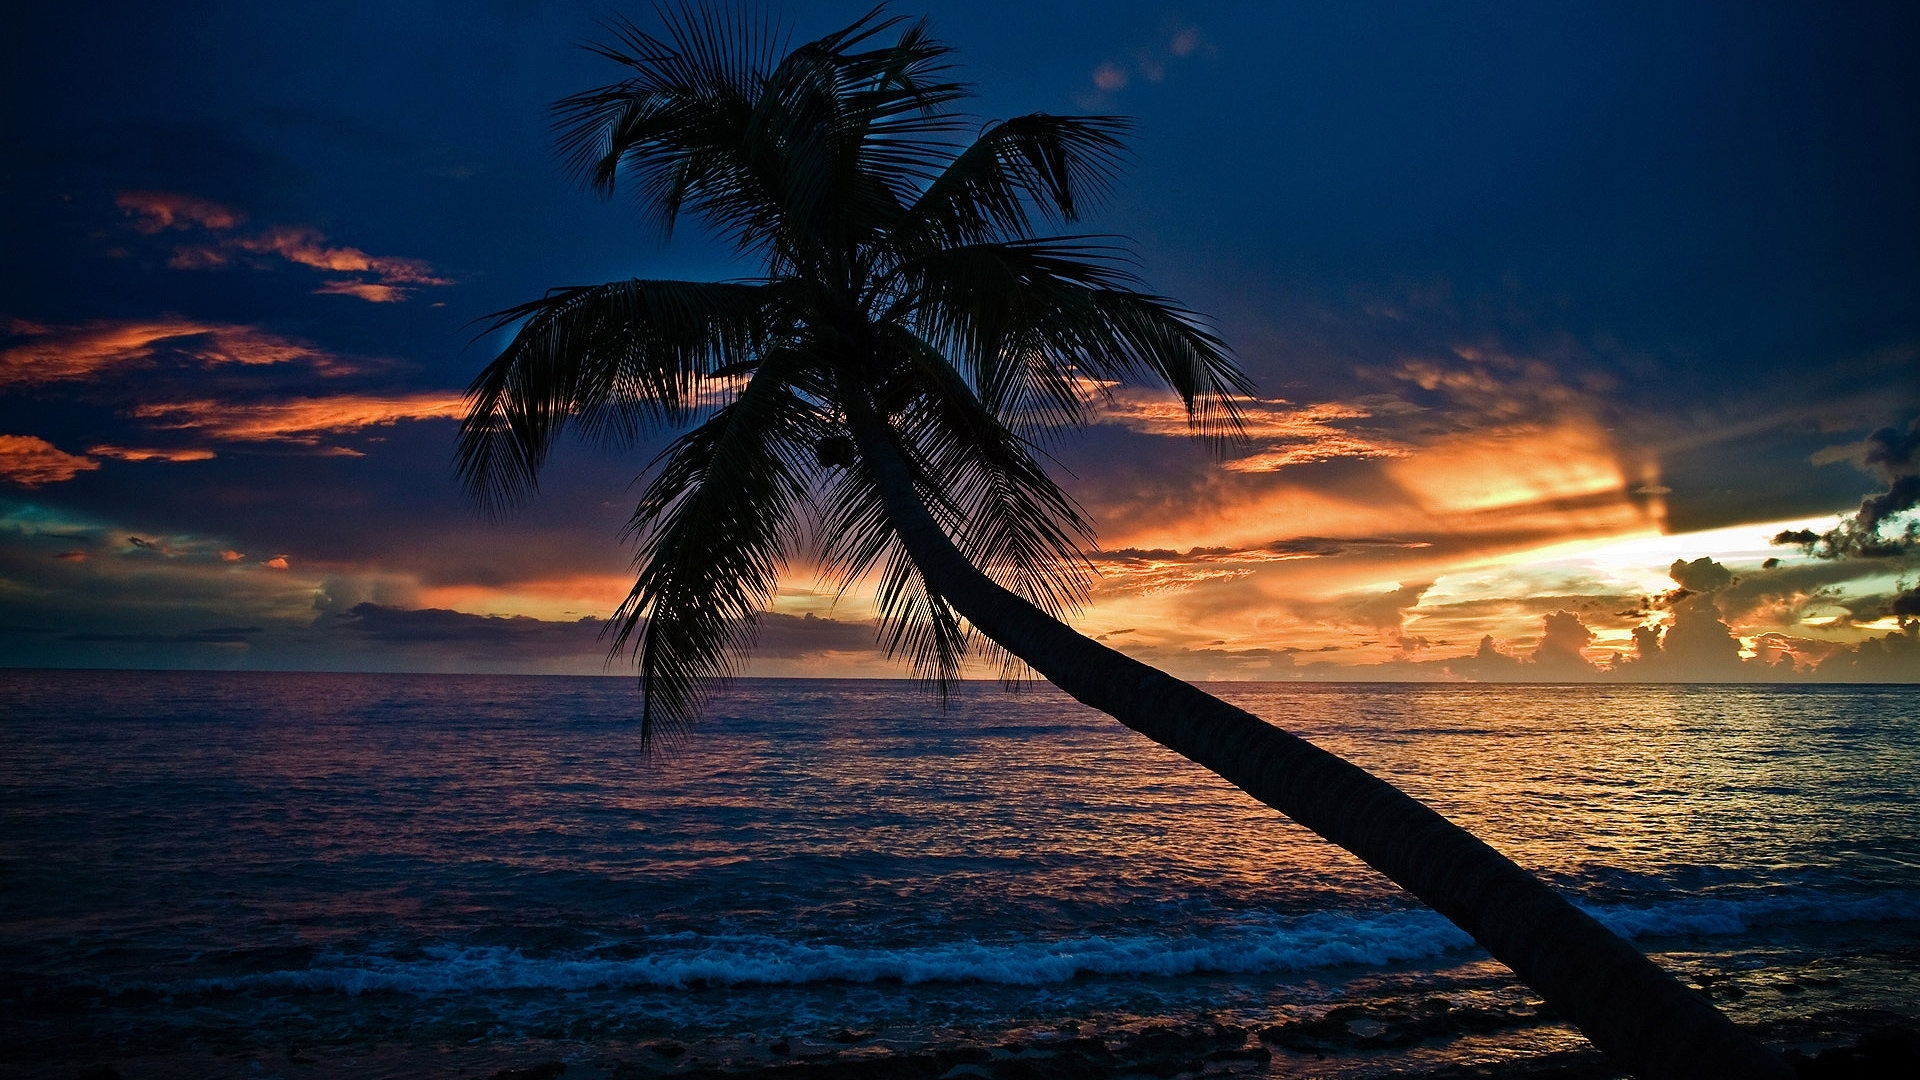 beach at night hd wallpaper. - media file | pixelstalk